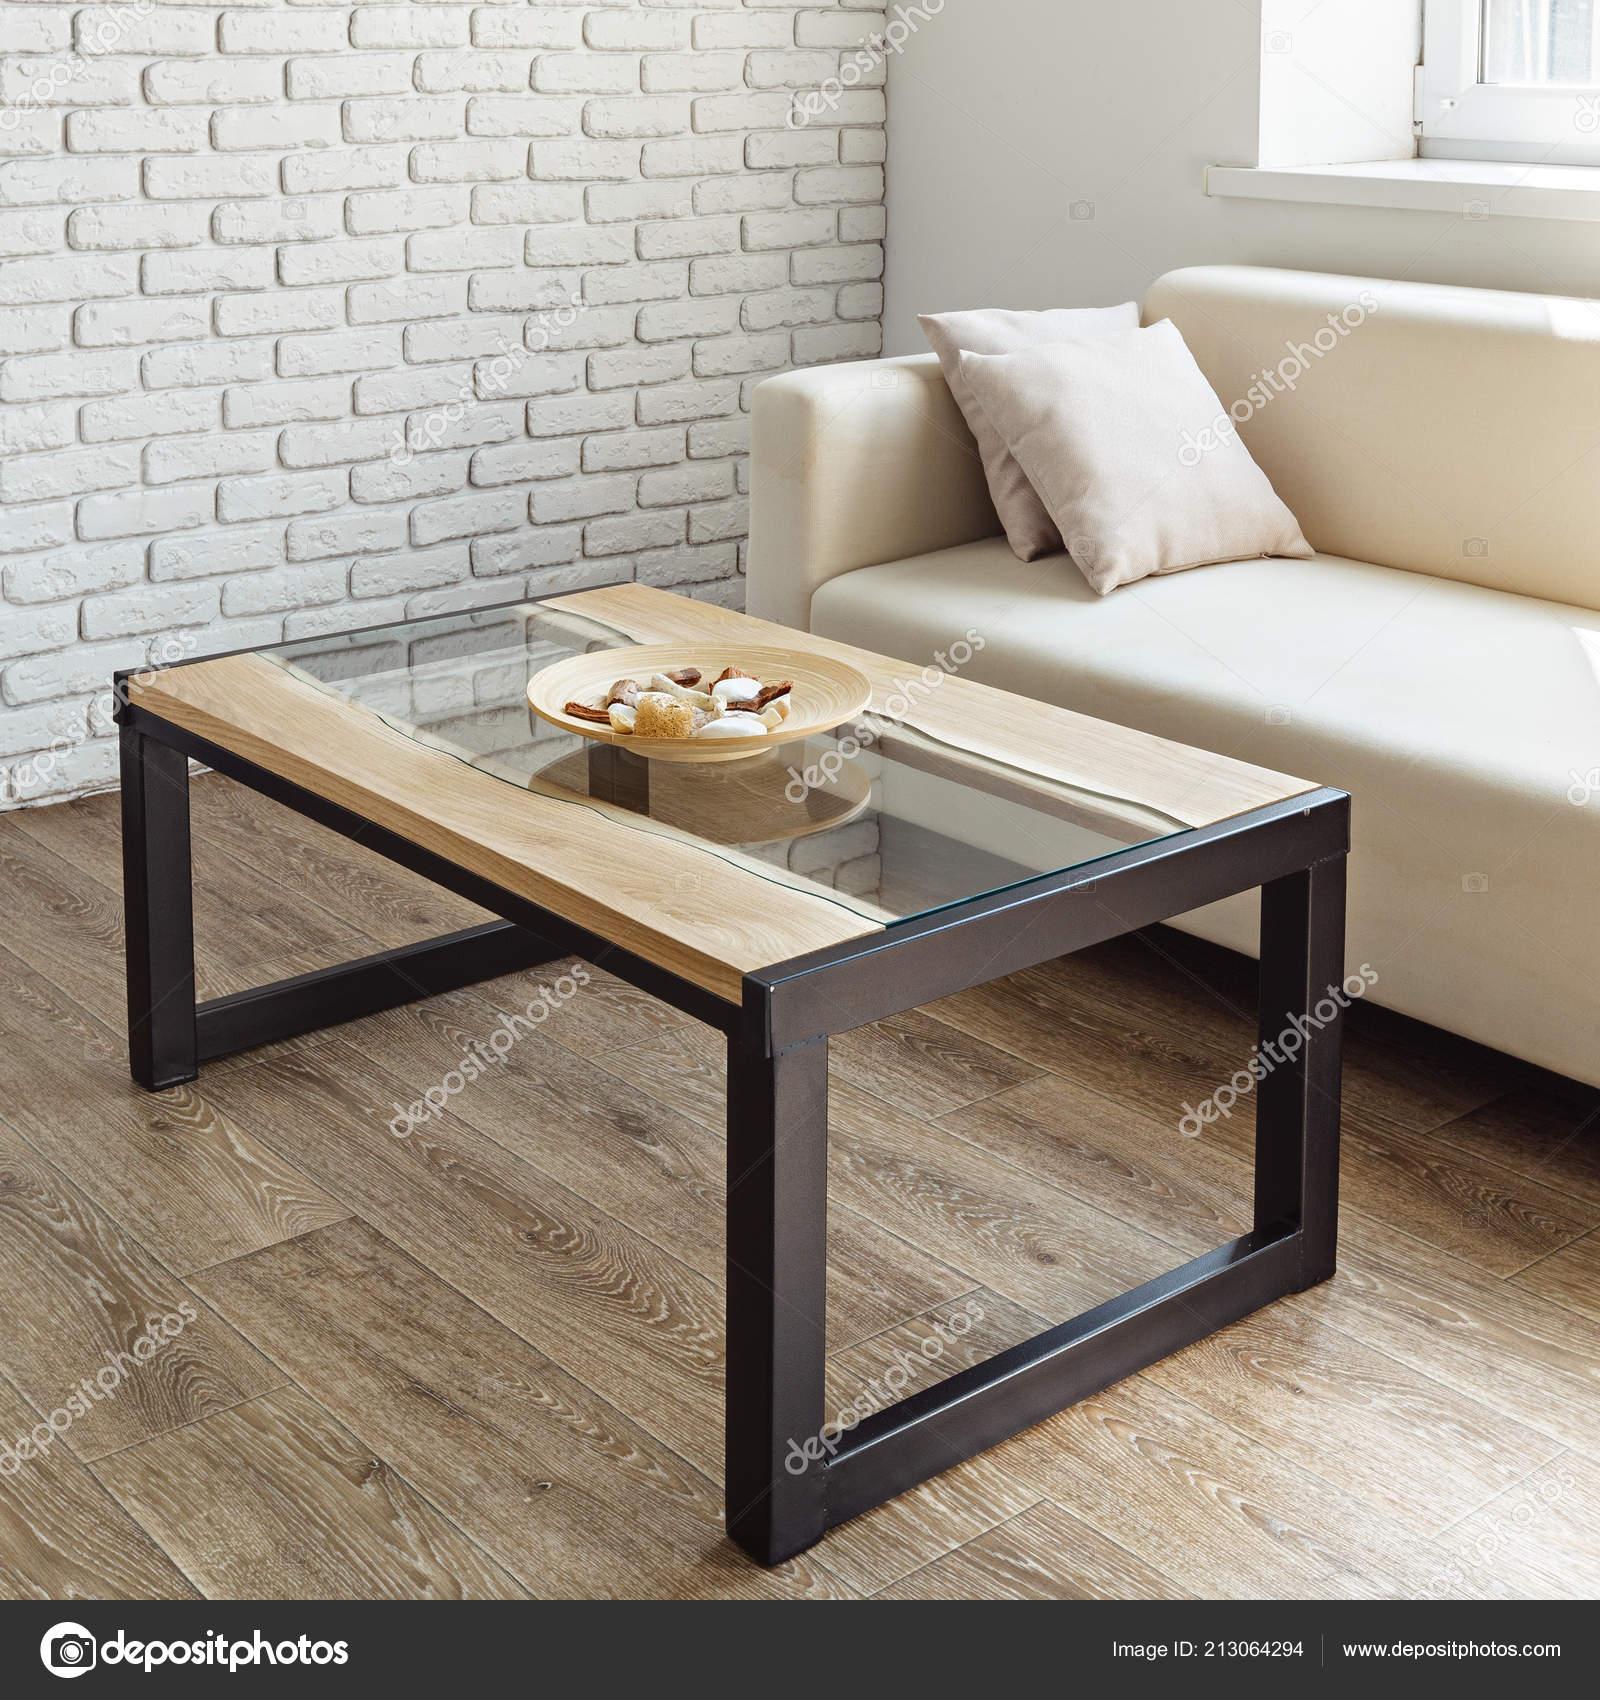 Peachy Modern Wooden Table Stylish Loft Interior Stock Photo Inzonedesignstudio Interior Chair Design Inzonedesignstudiocom